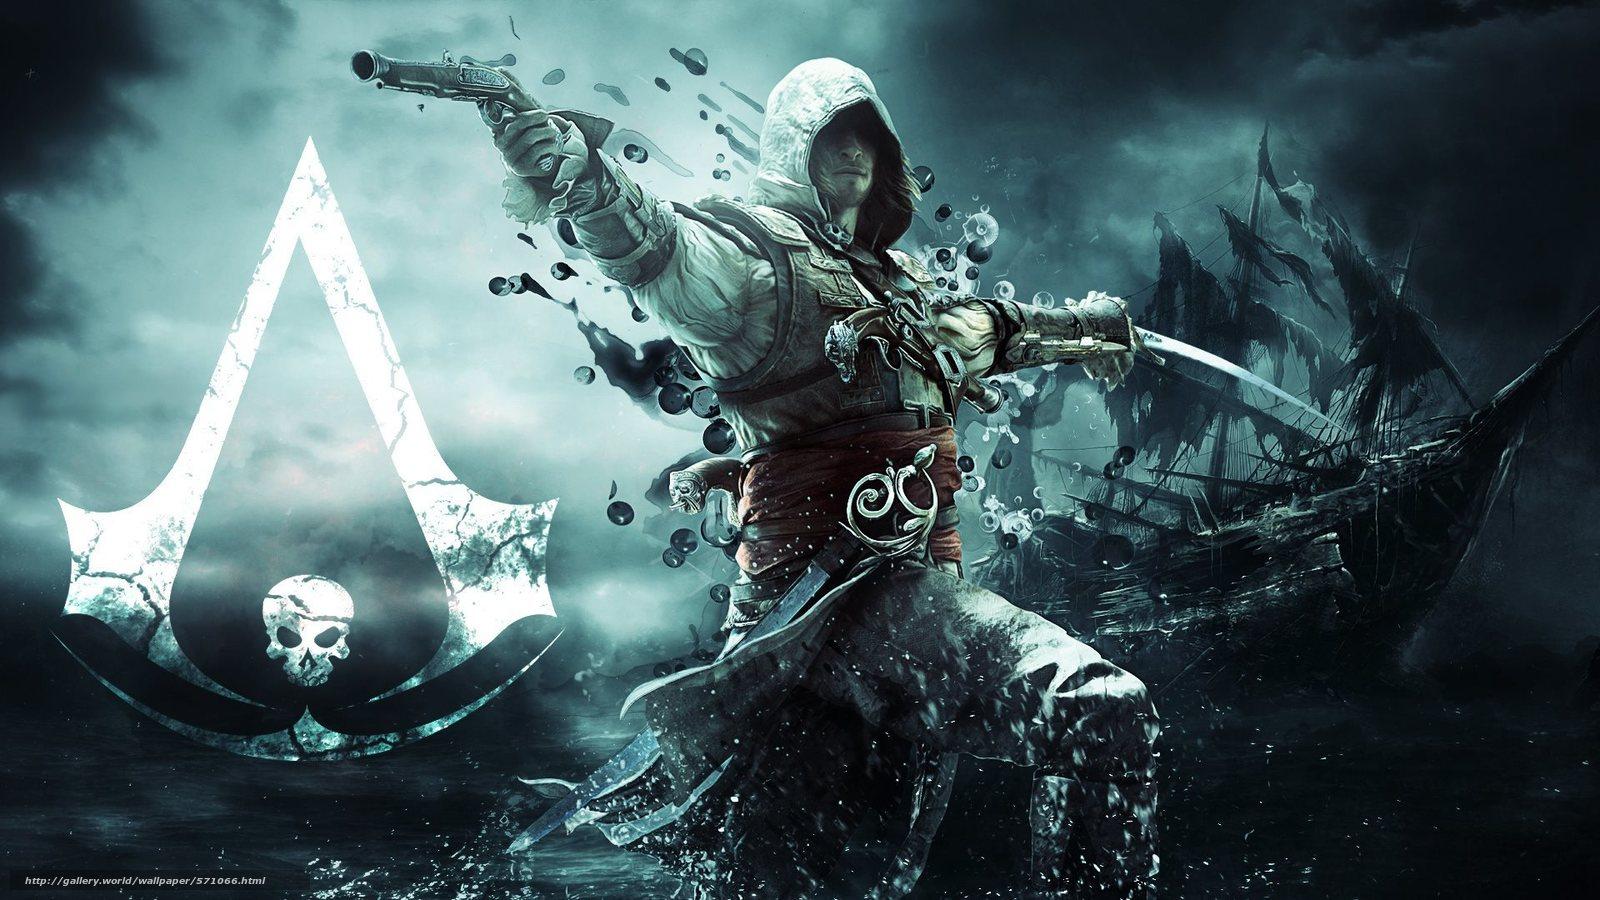 Download wallpaper Assassin pirate ship flag desktop wallpaper 1600x900